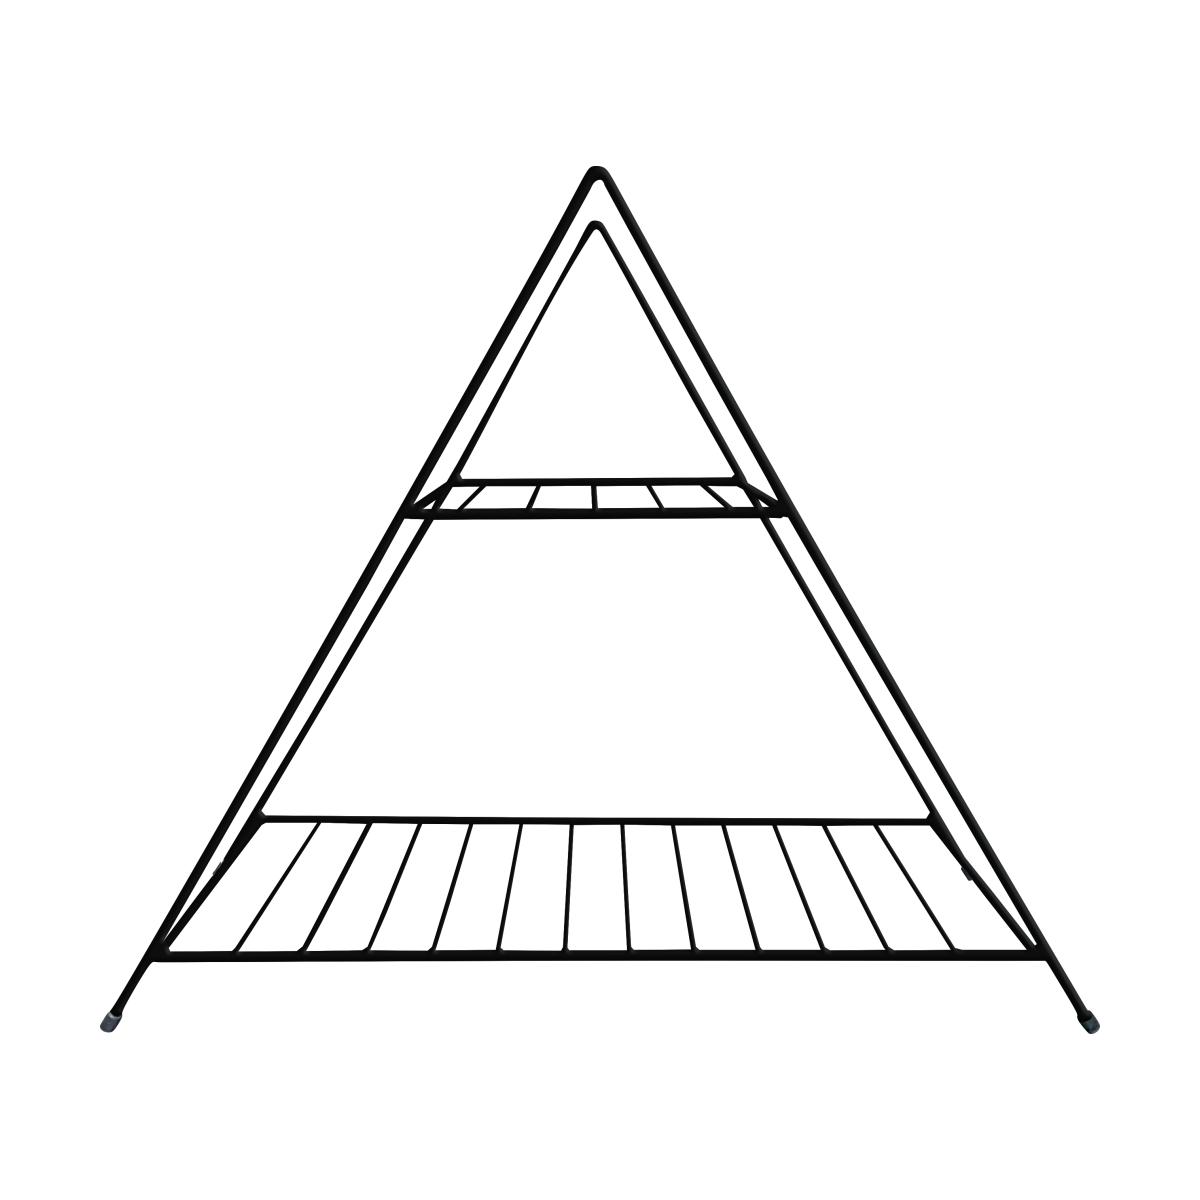 Aparador de Ferro Triangular Pequeno Estilo Industrial Preto 56cm